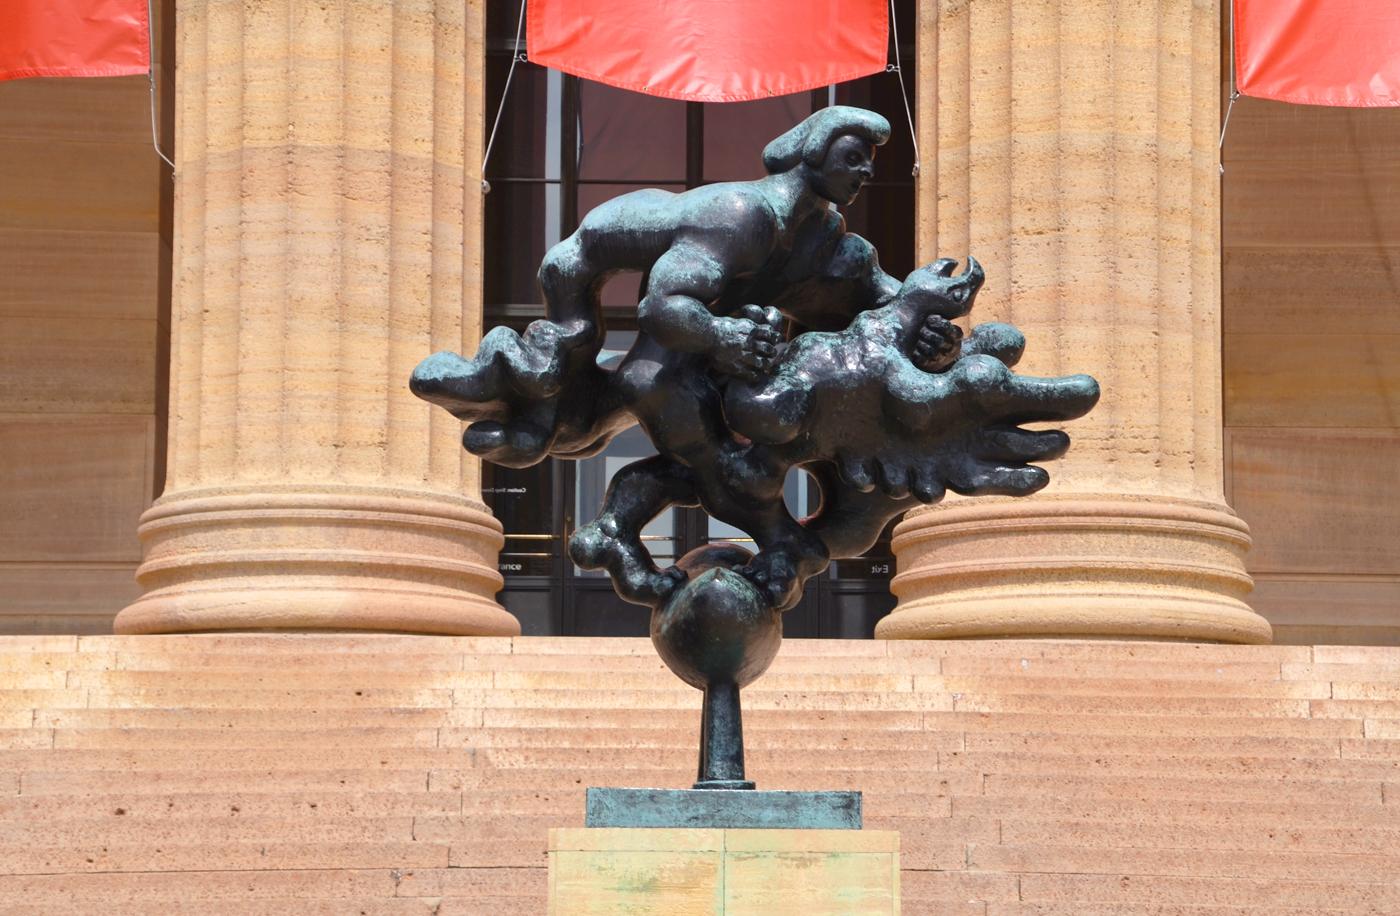 Prometheus Strangling the Vulture - Association for Public Art